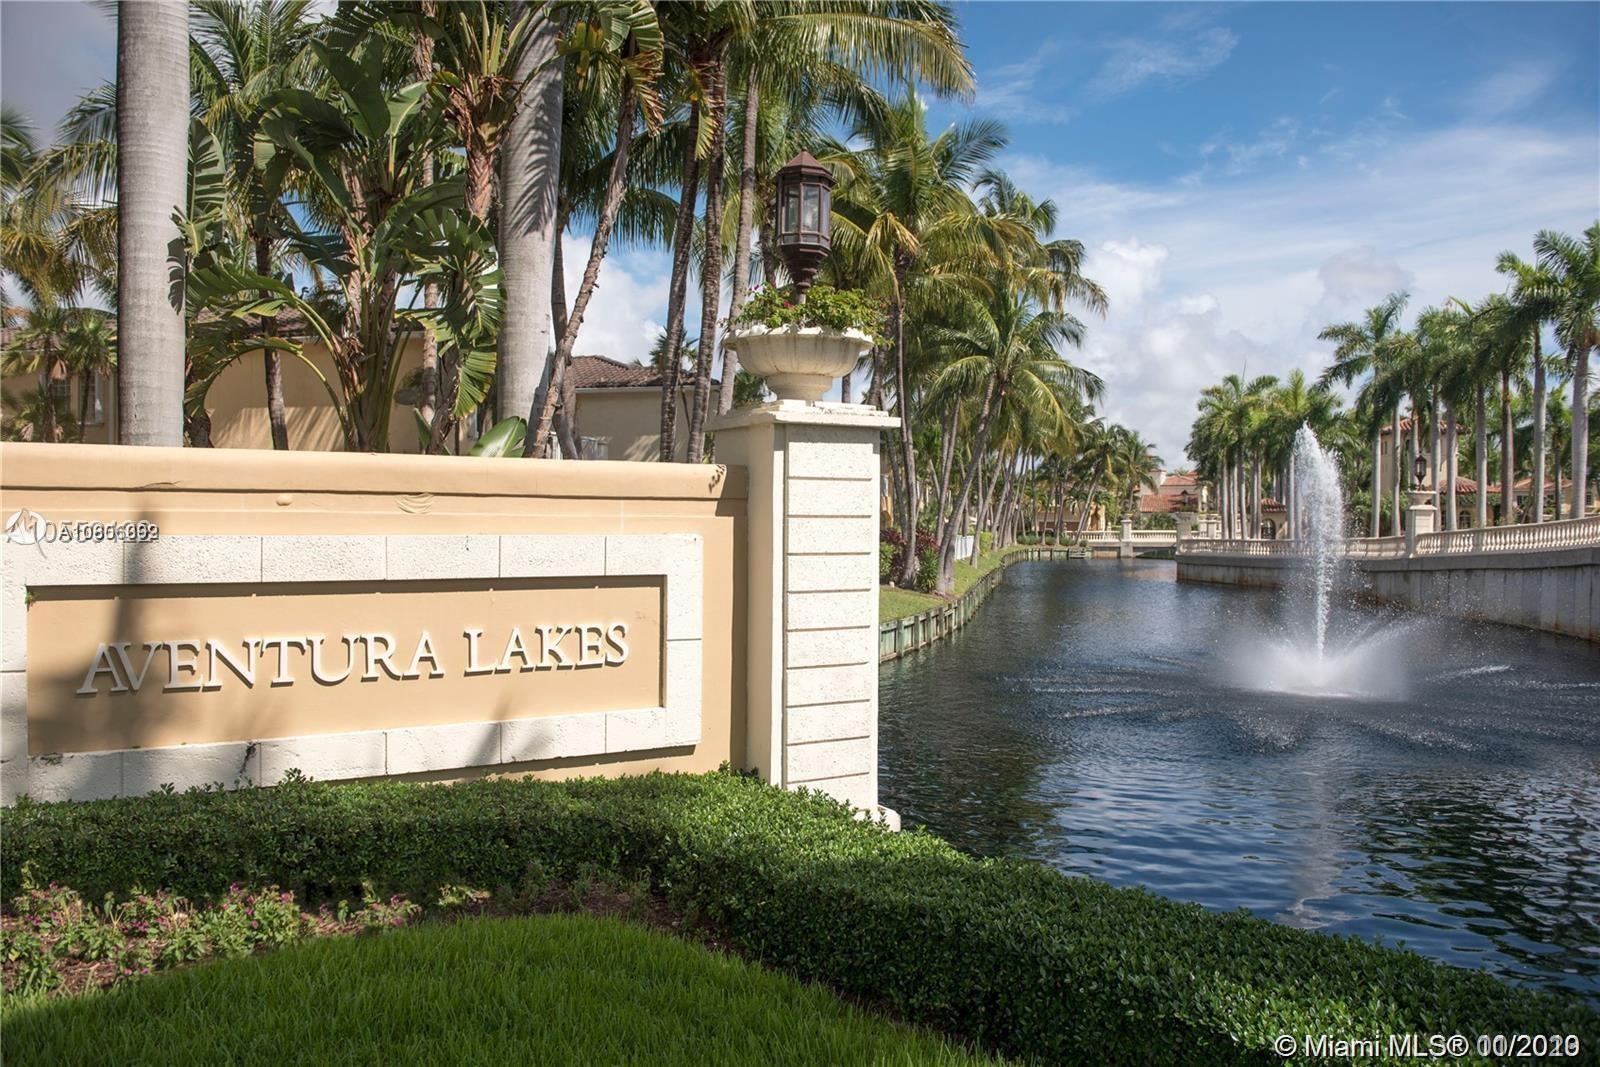 21142 NE 31st Pl, Aventura, Florida 33180, 3 Bedrooms Bedrooms, ,2 BathroomsBathrooms,Residential,For Sale,21142 NE 31st Pl,A10806092